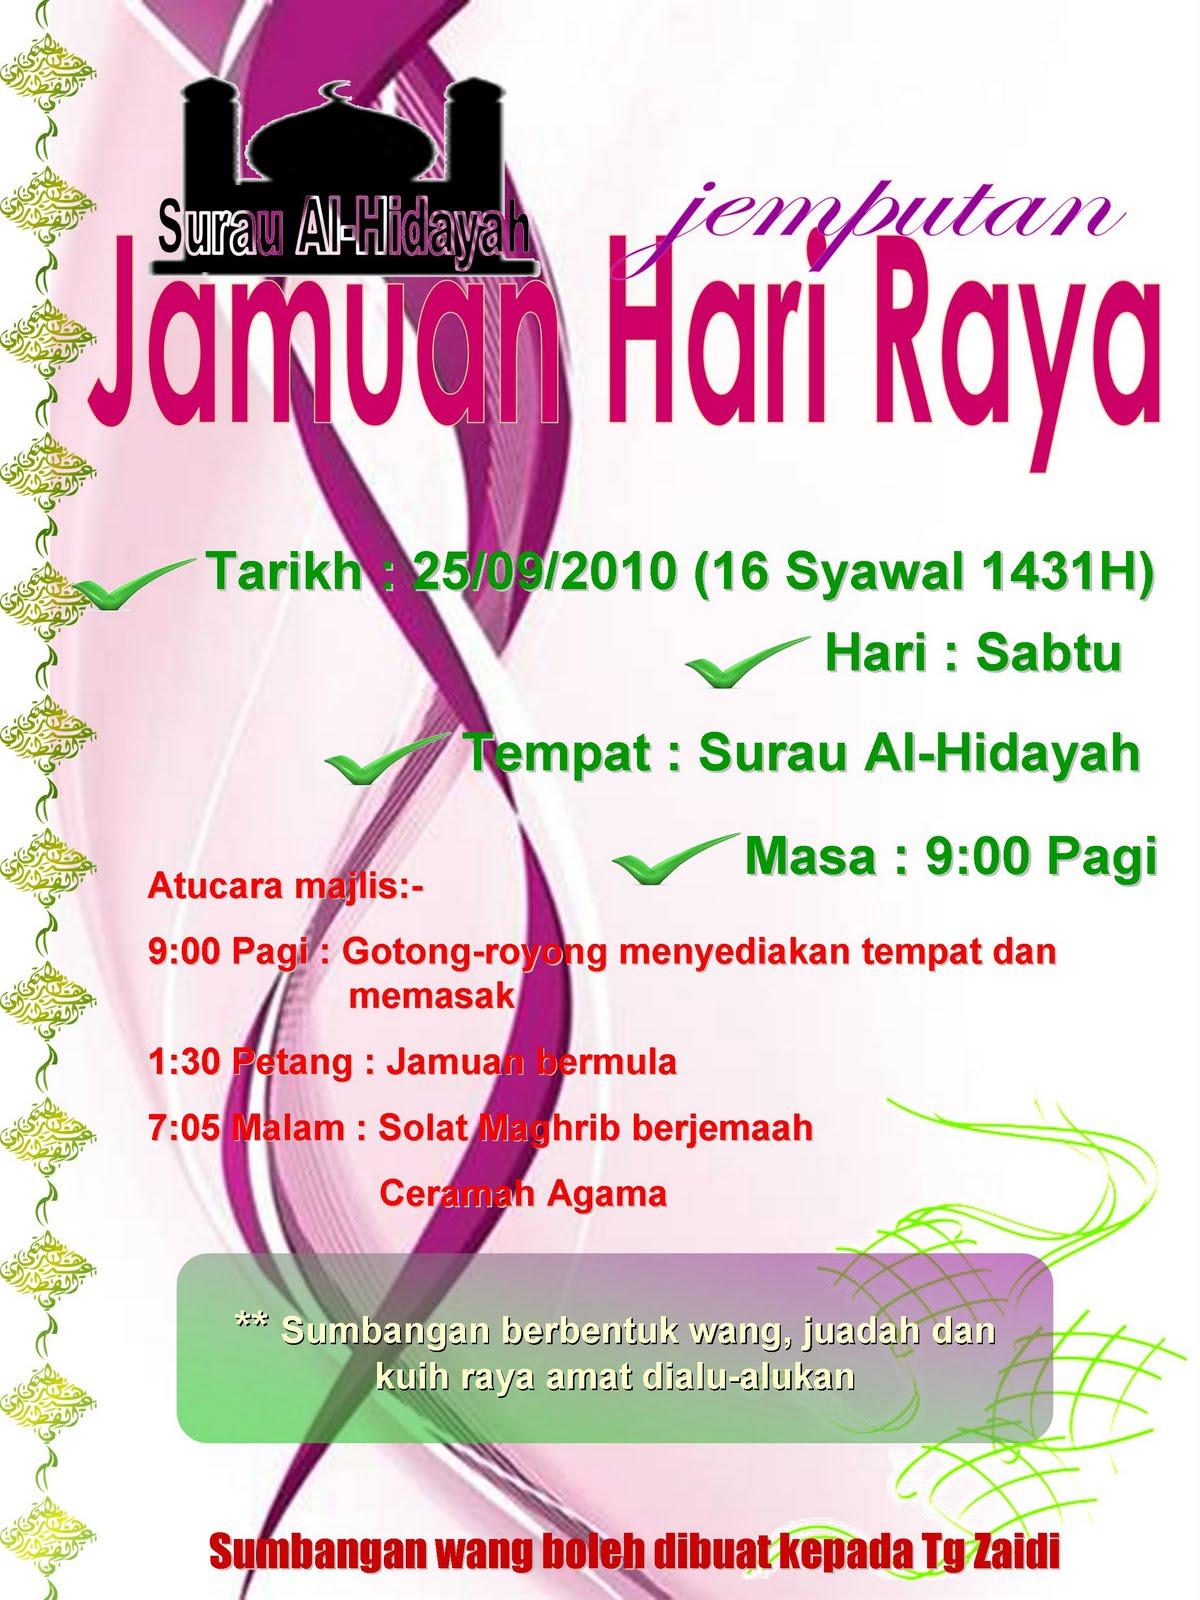 Jemputan Hari Raya Joy Studio Design Gallery Best Design